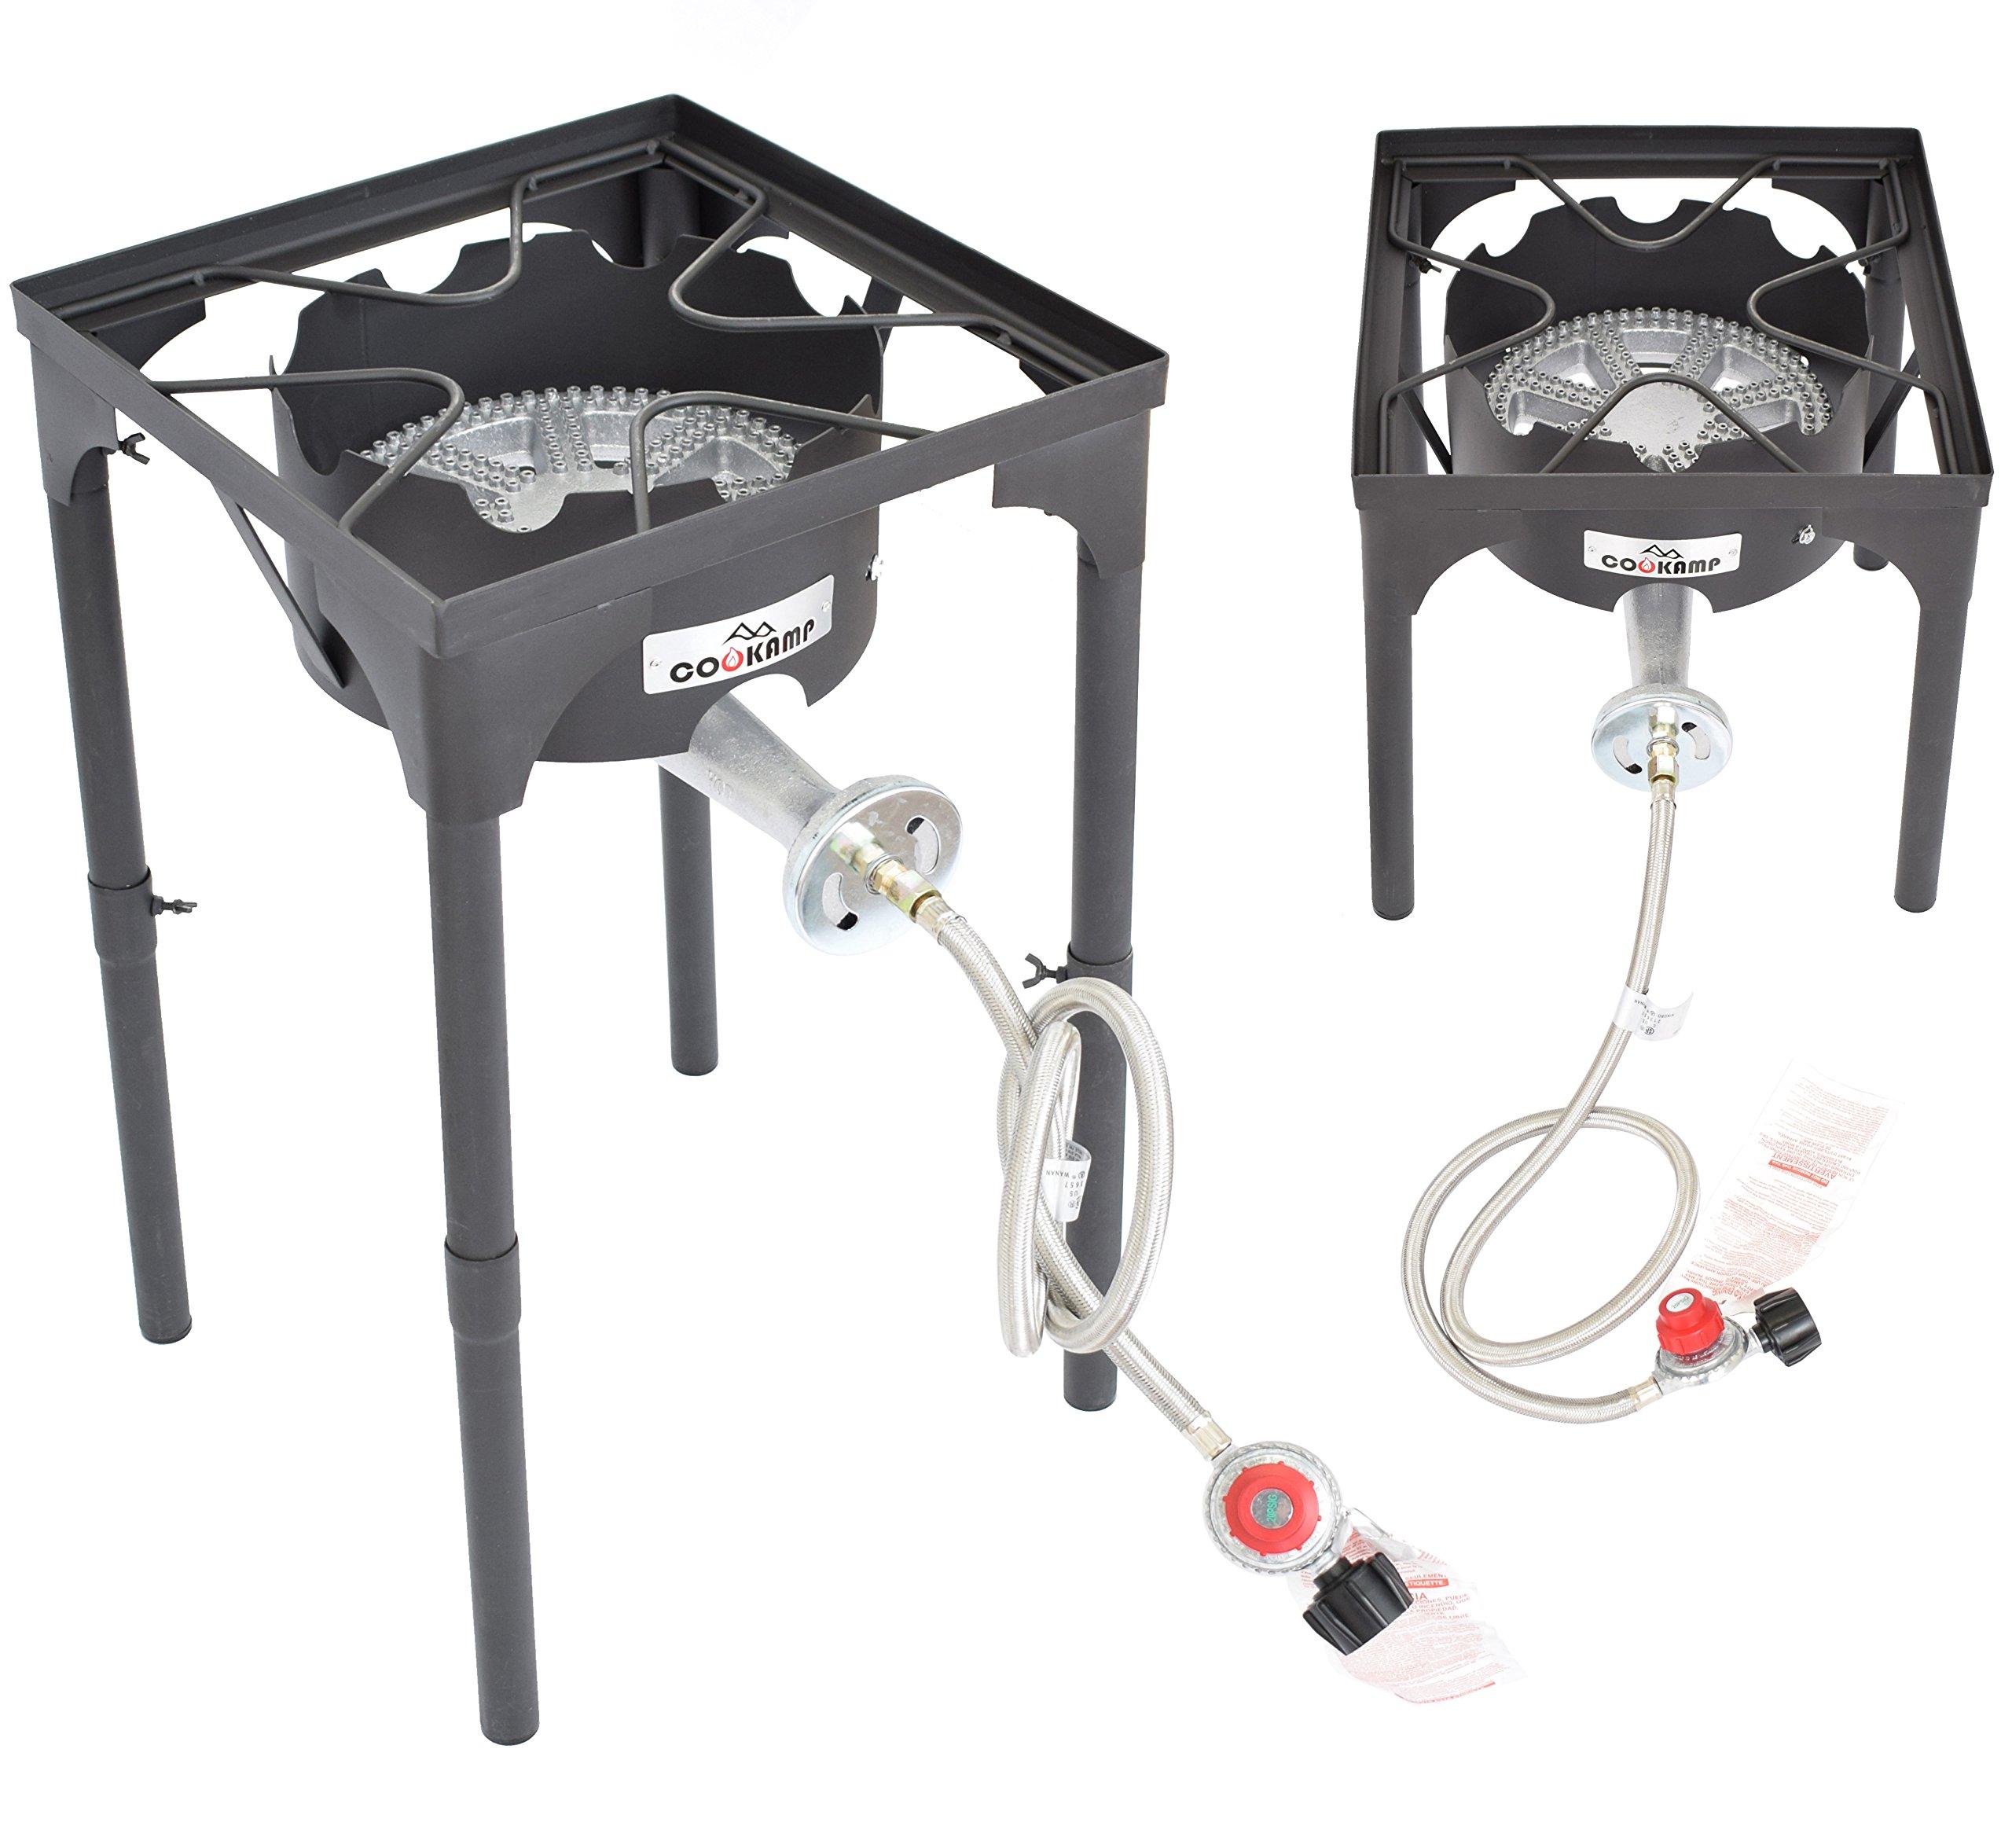 COOKAMP High Pressure Banjo 1-Burner Outdoor Camp Stove with Adjustable Height. 0-20 PSI Adjustable Regulator and Steel Braided Hose [ 2018 New Model ] SA1550